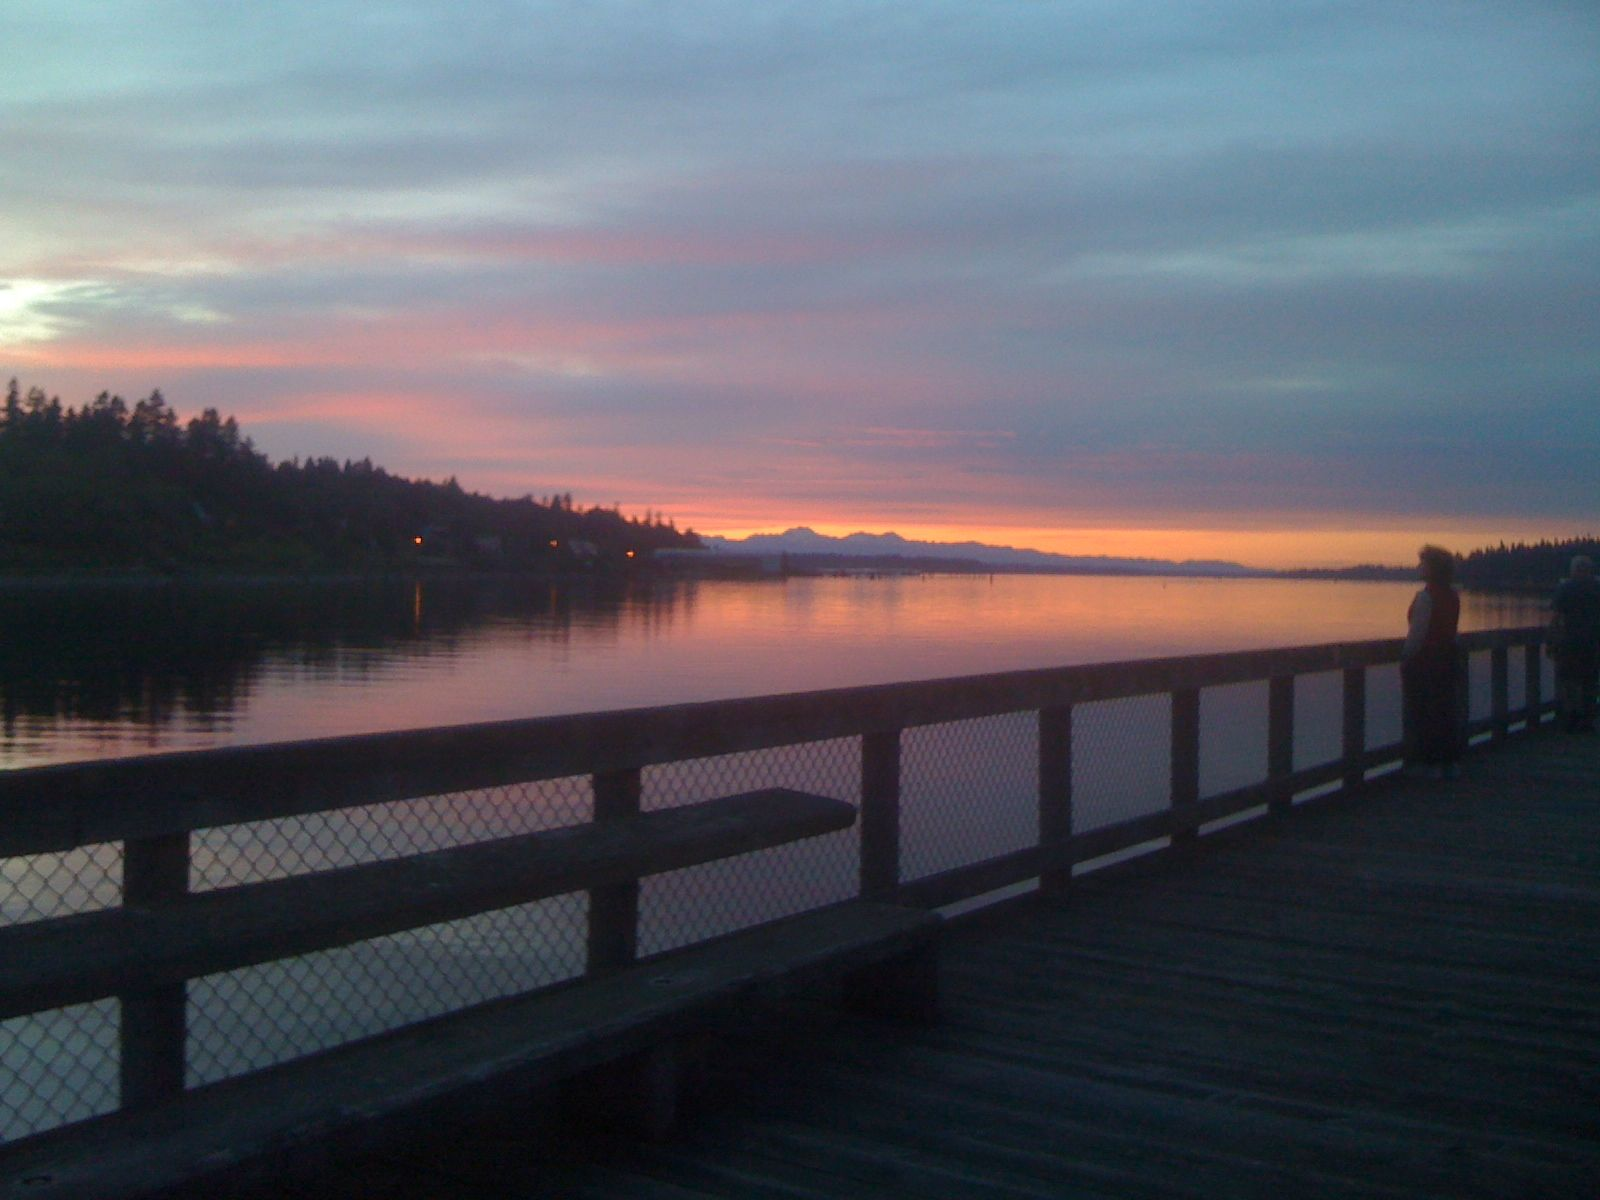 Sunset at Percival Landing Olympia, WA